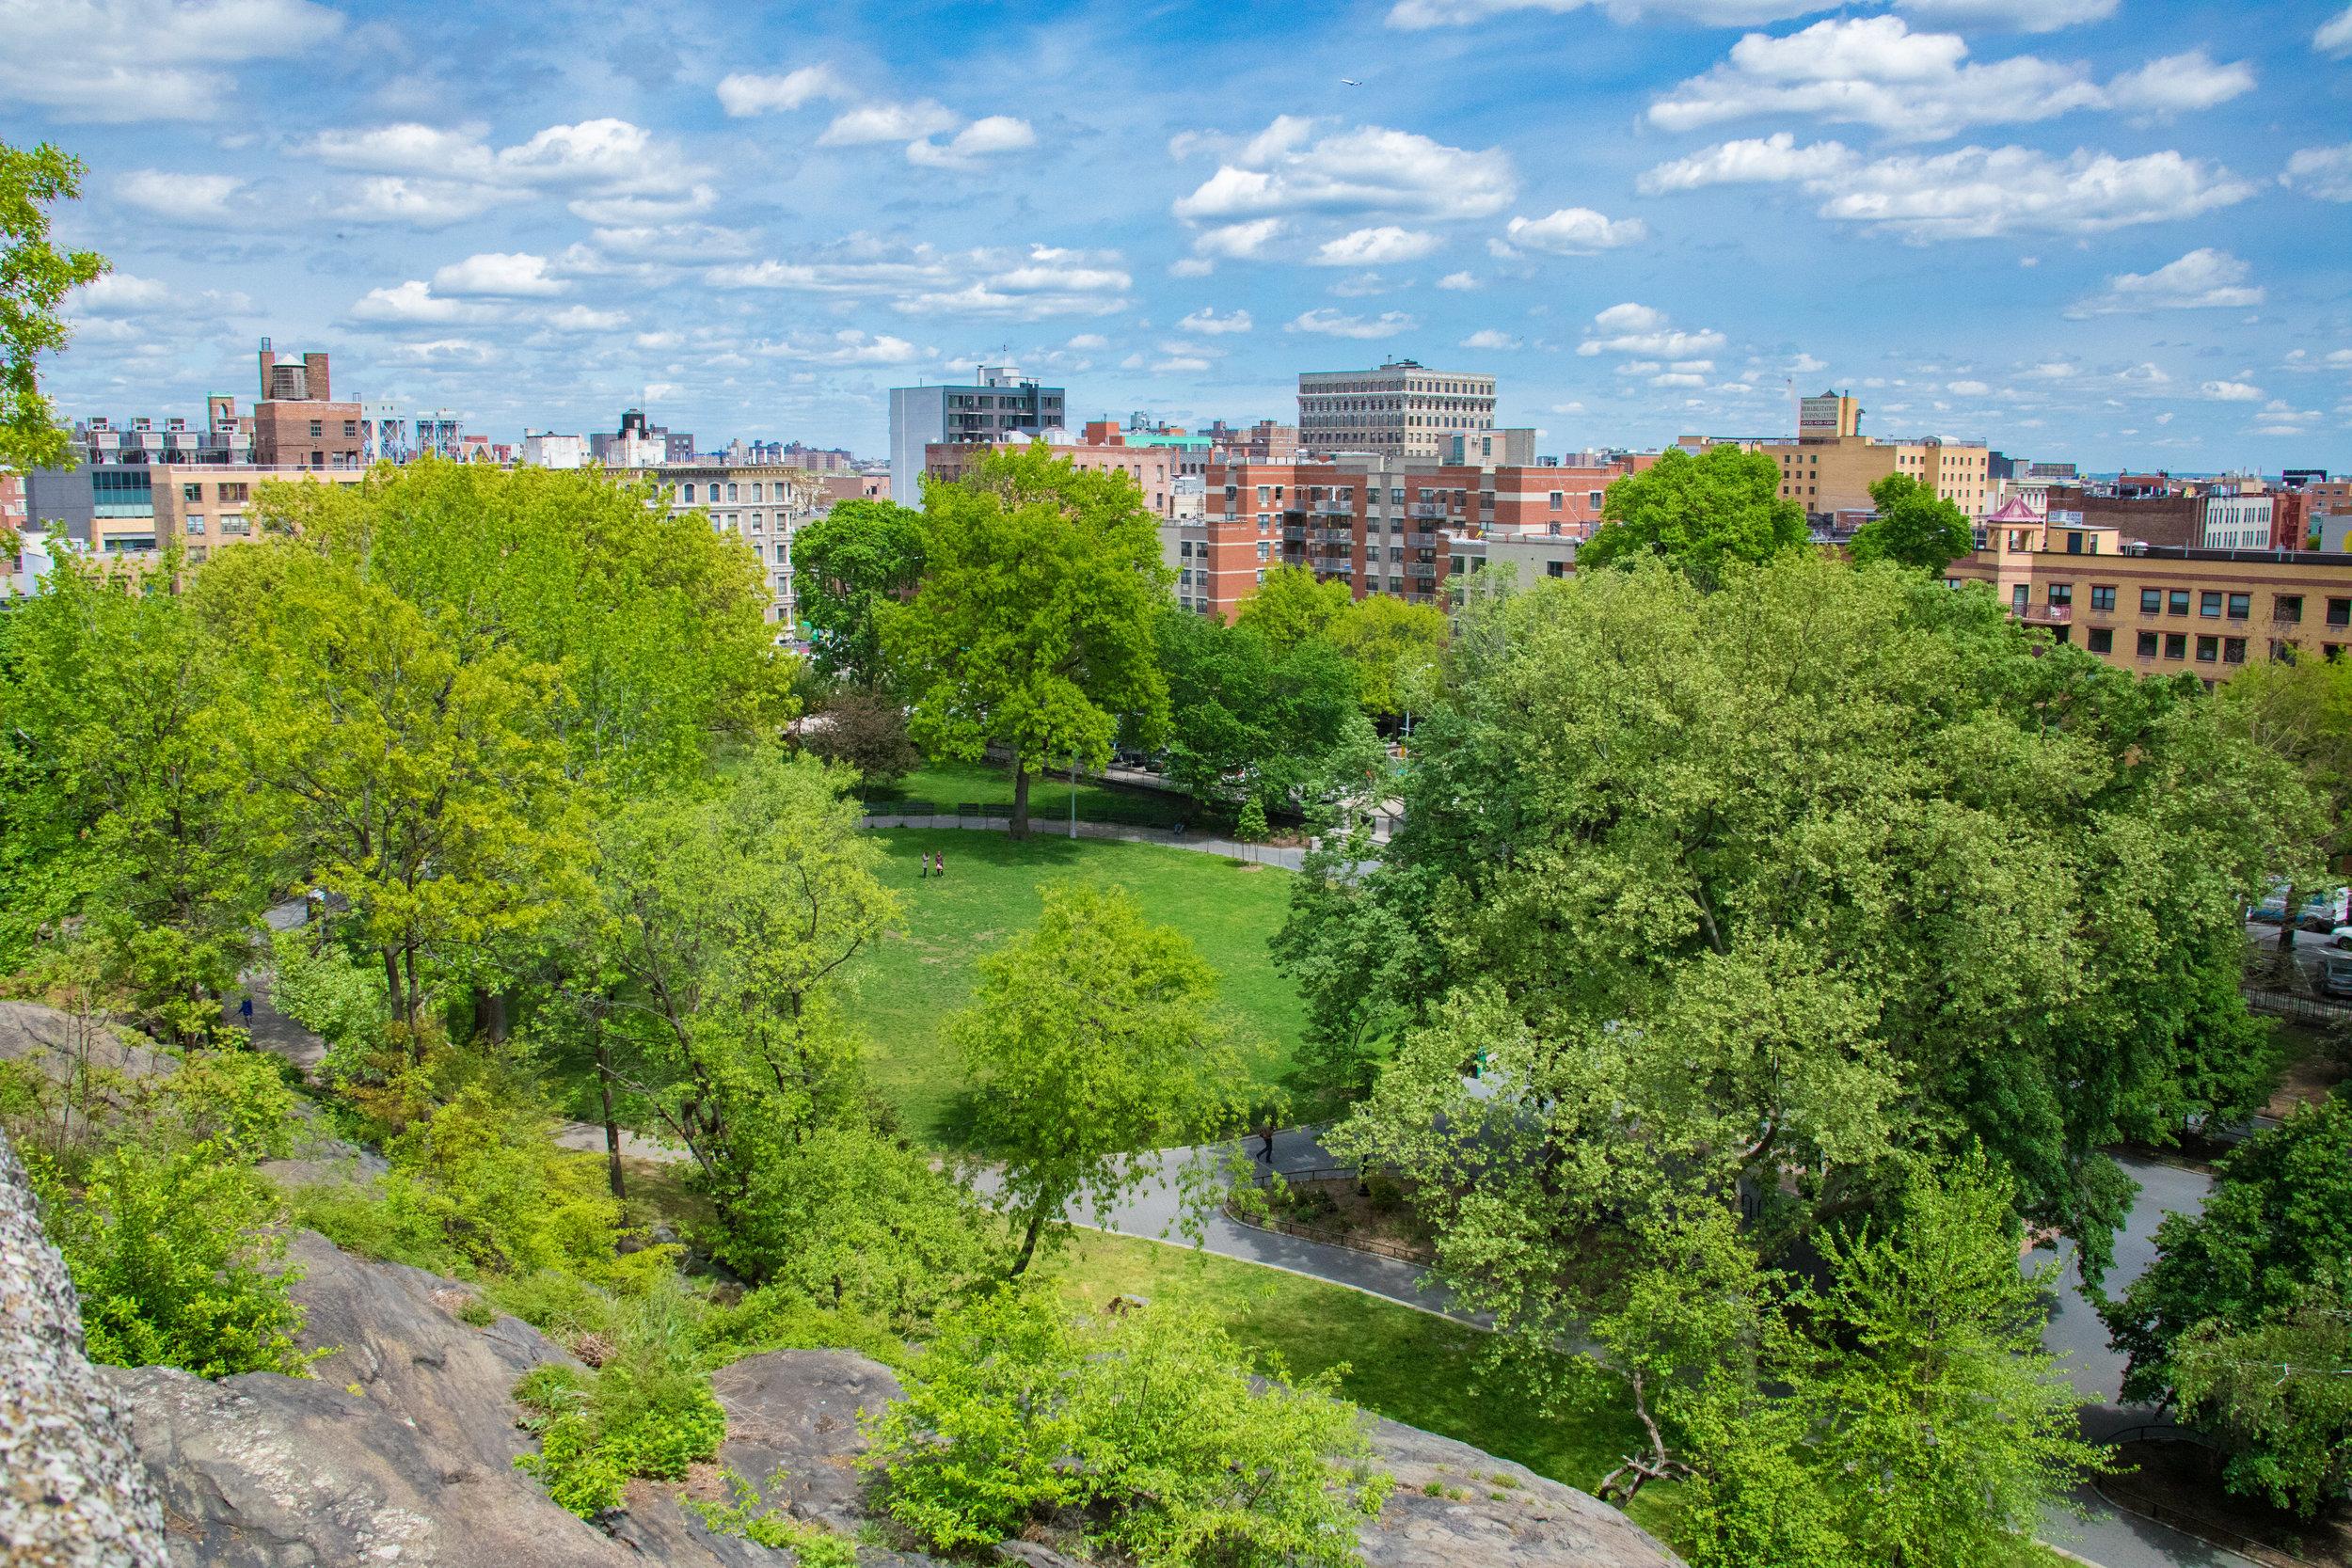 LSNY_Harlem-17.jpg